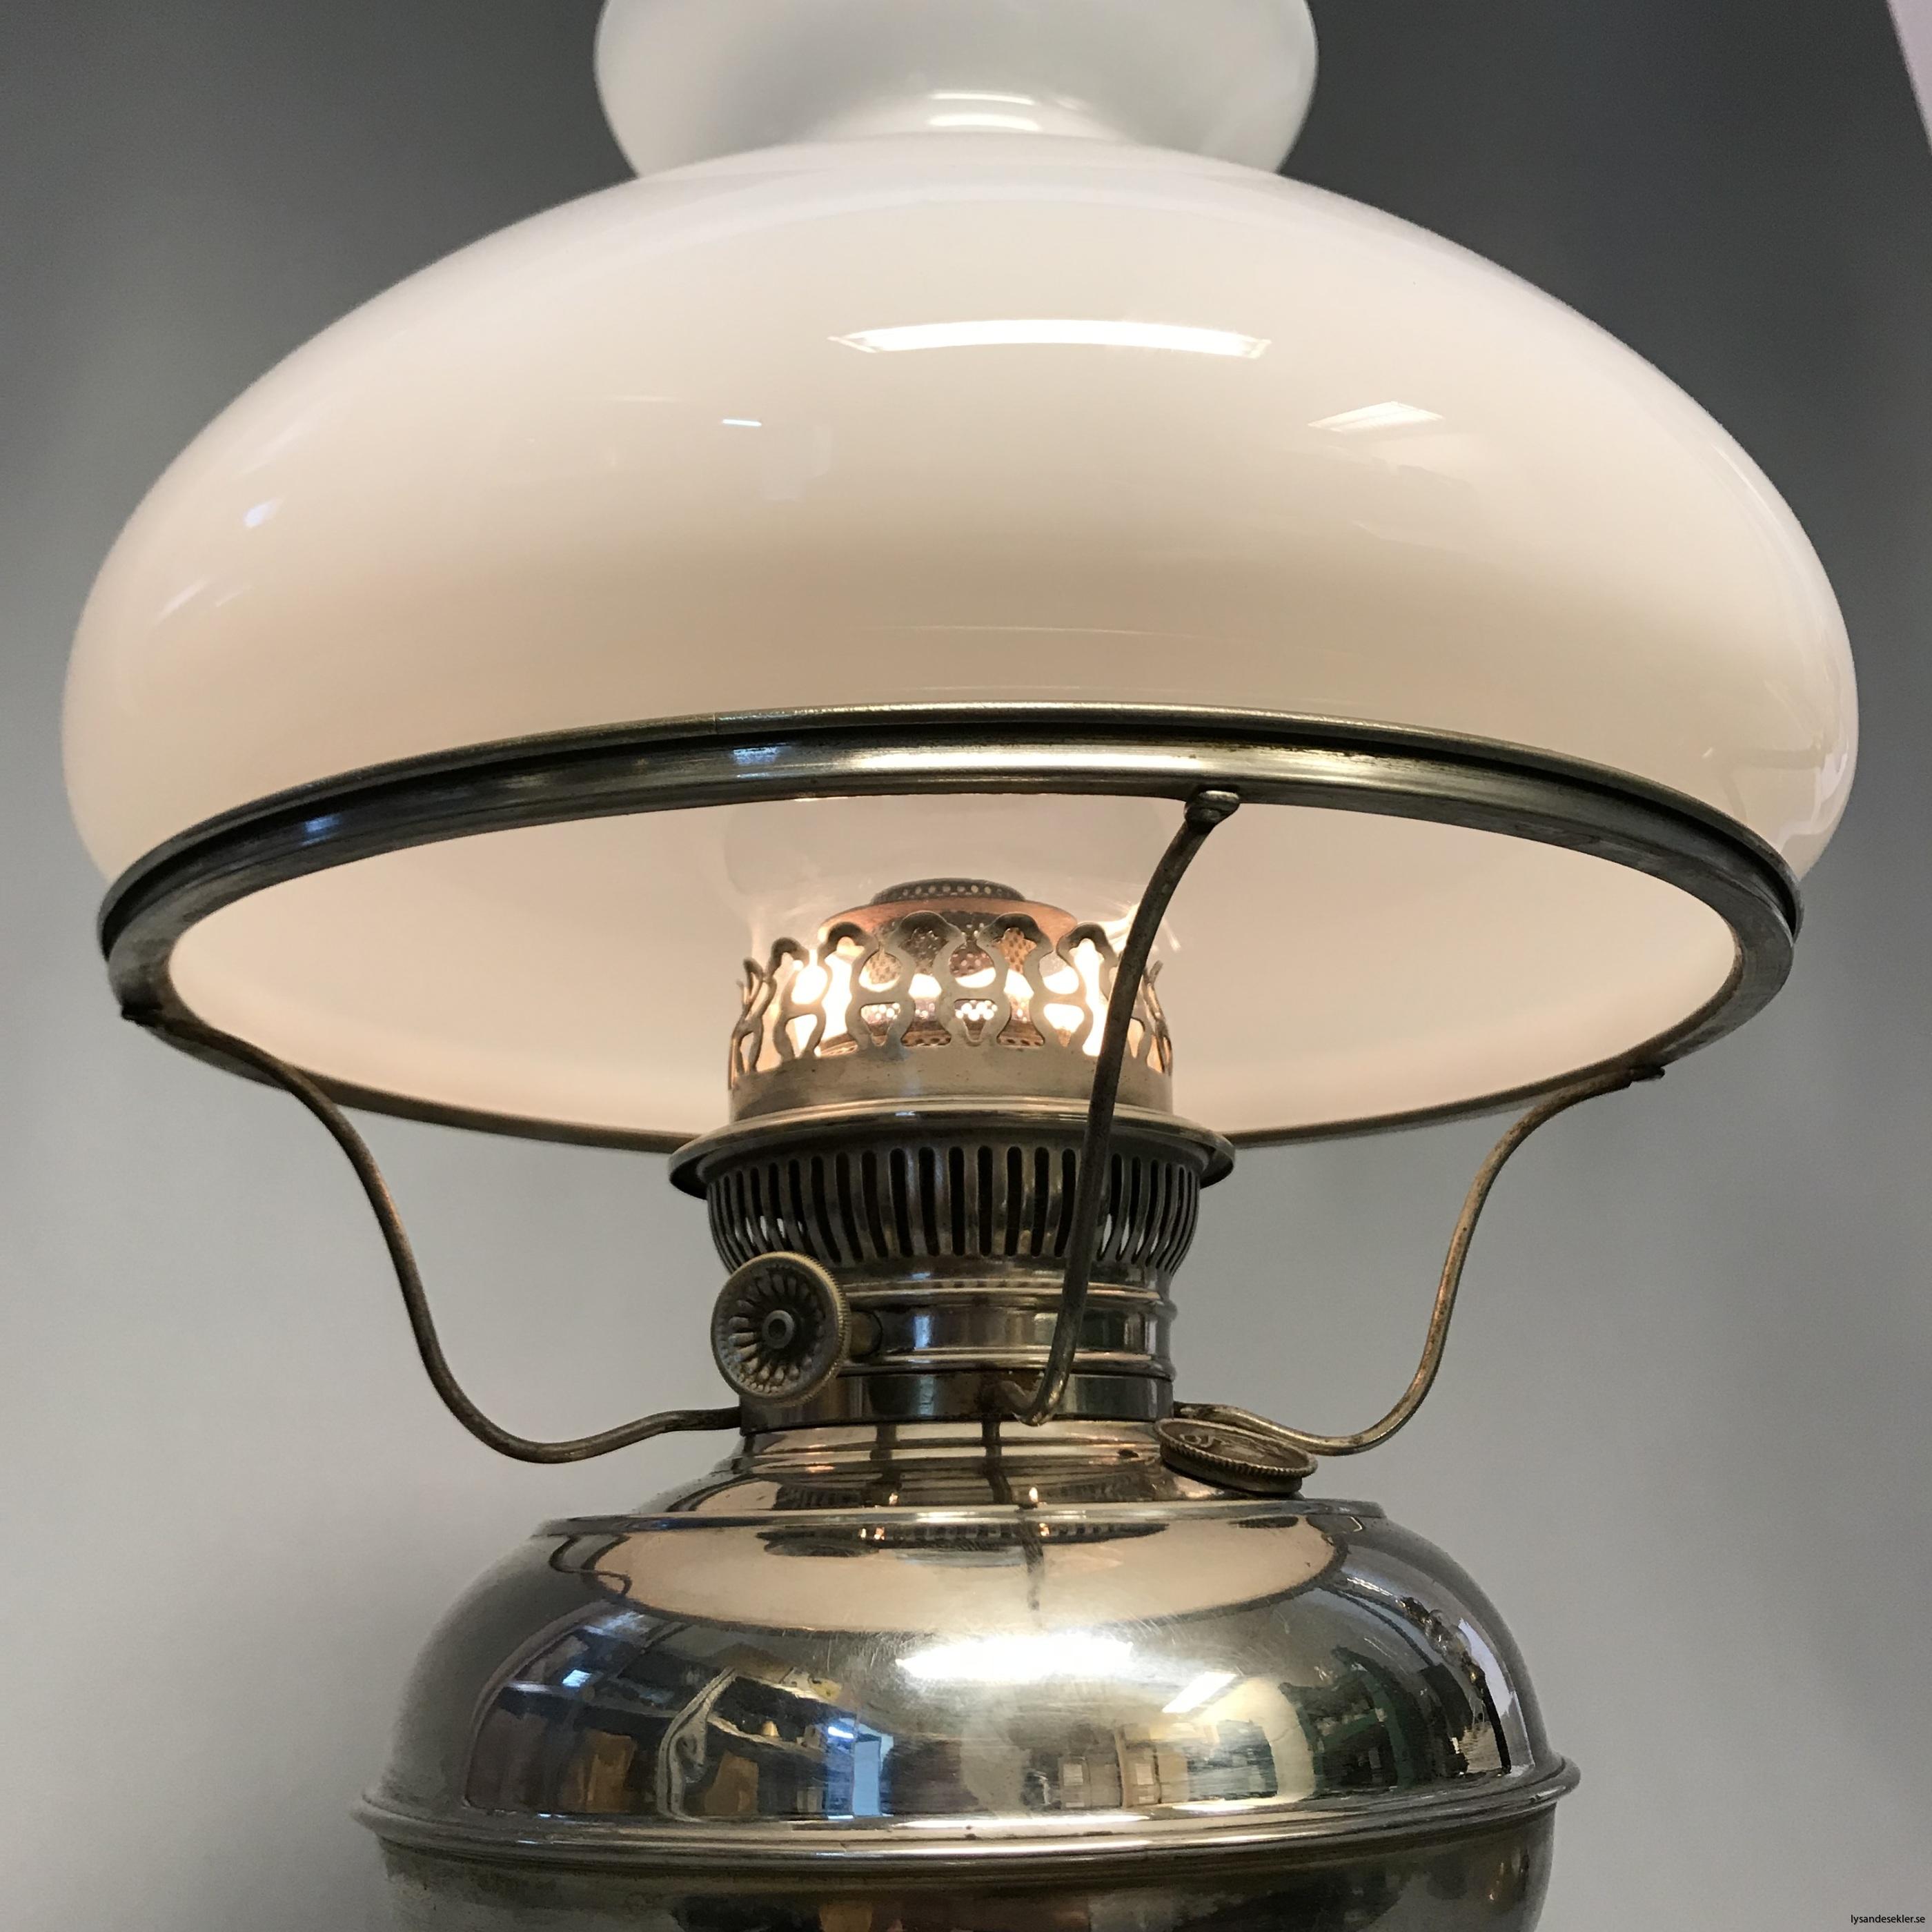 rayo fotogenlampa oljelampa usa amerikansk 22 rayoskärm skärmring4